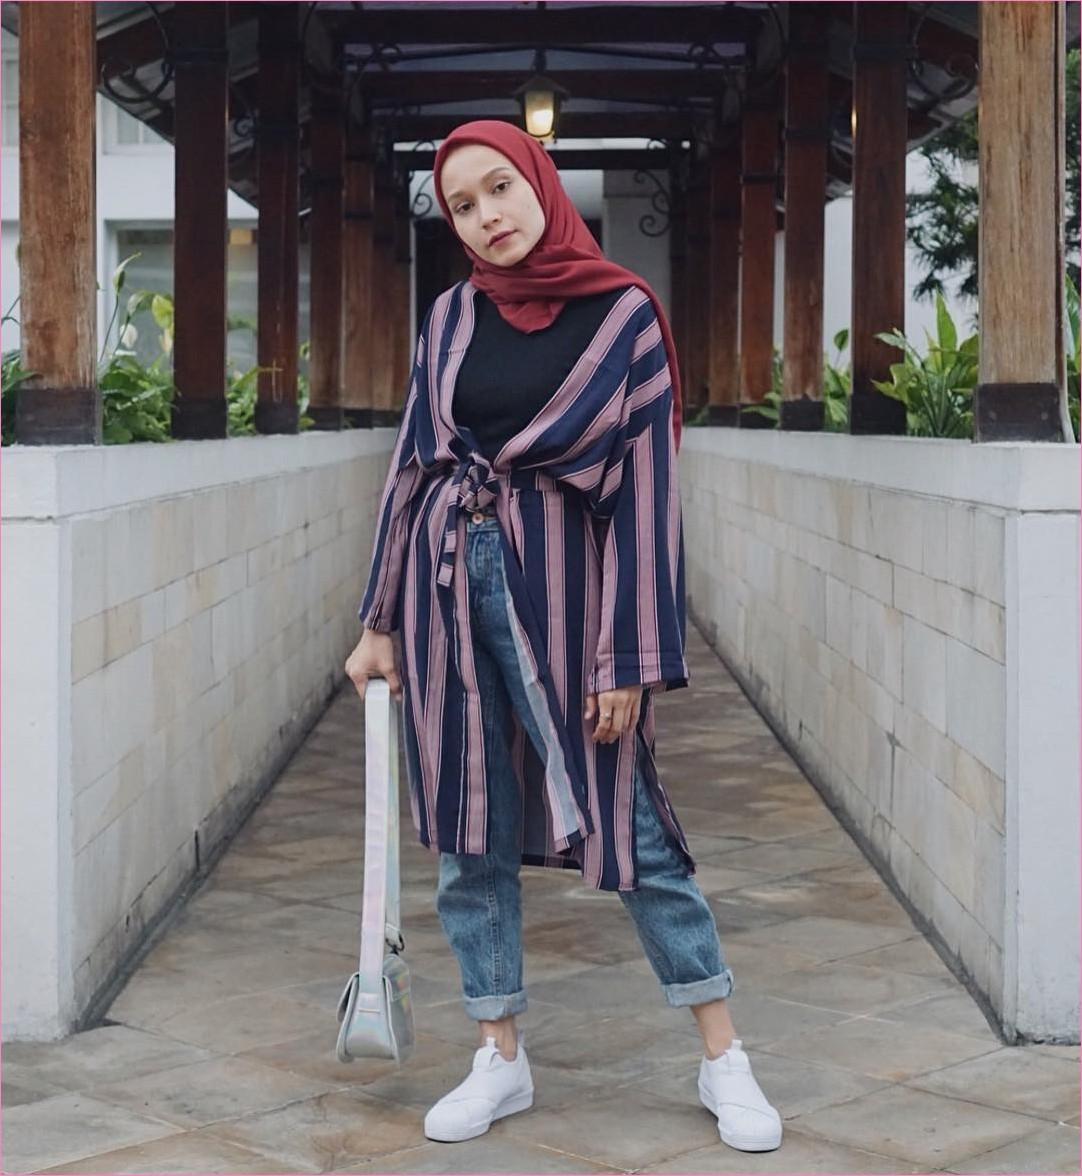 Outfit Celana Jeans Untuk Hijabers Ala Selebgram 2018 mangset hitam outer biru tua ungu muda slingbags abu kerudung segiempat hijab square merah tua pants jeans denim kets sneakers putih ootd trendy